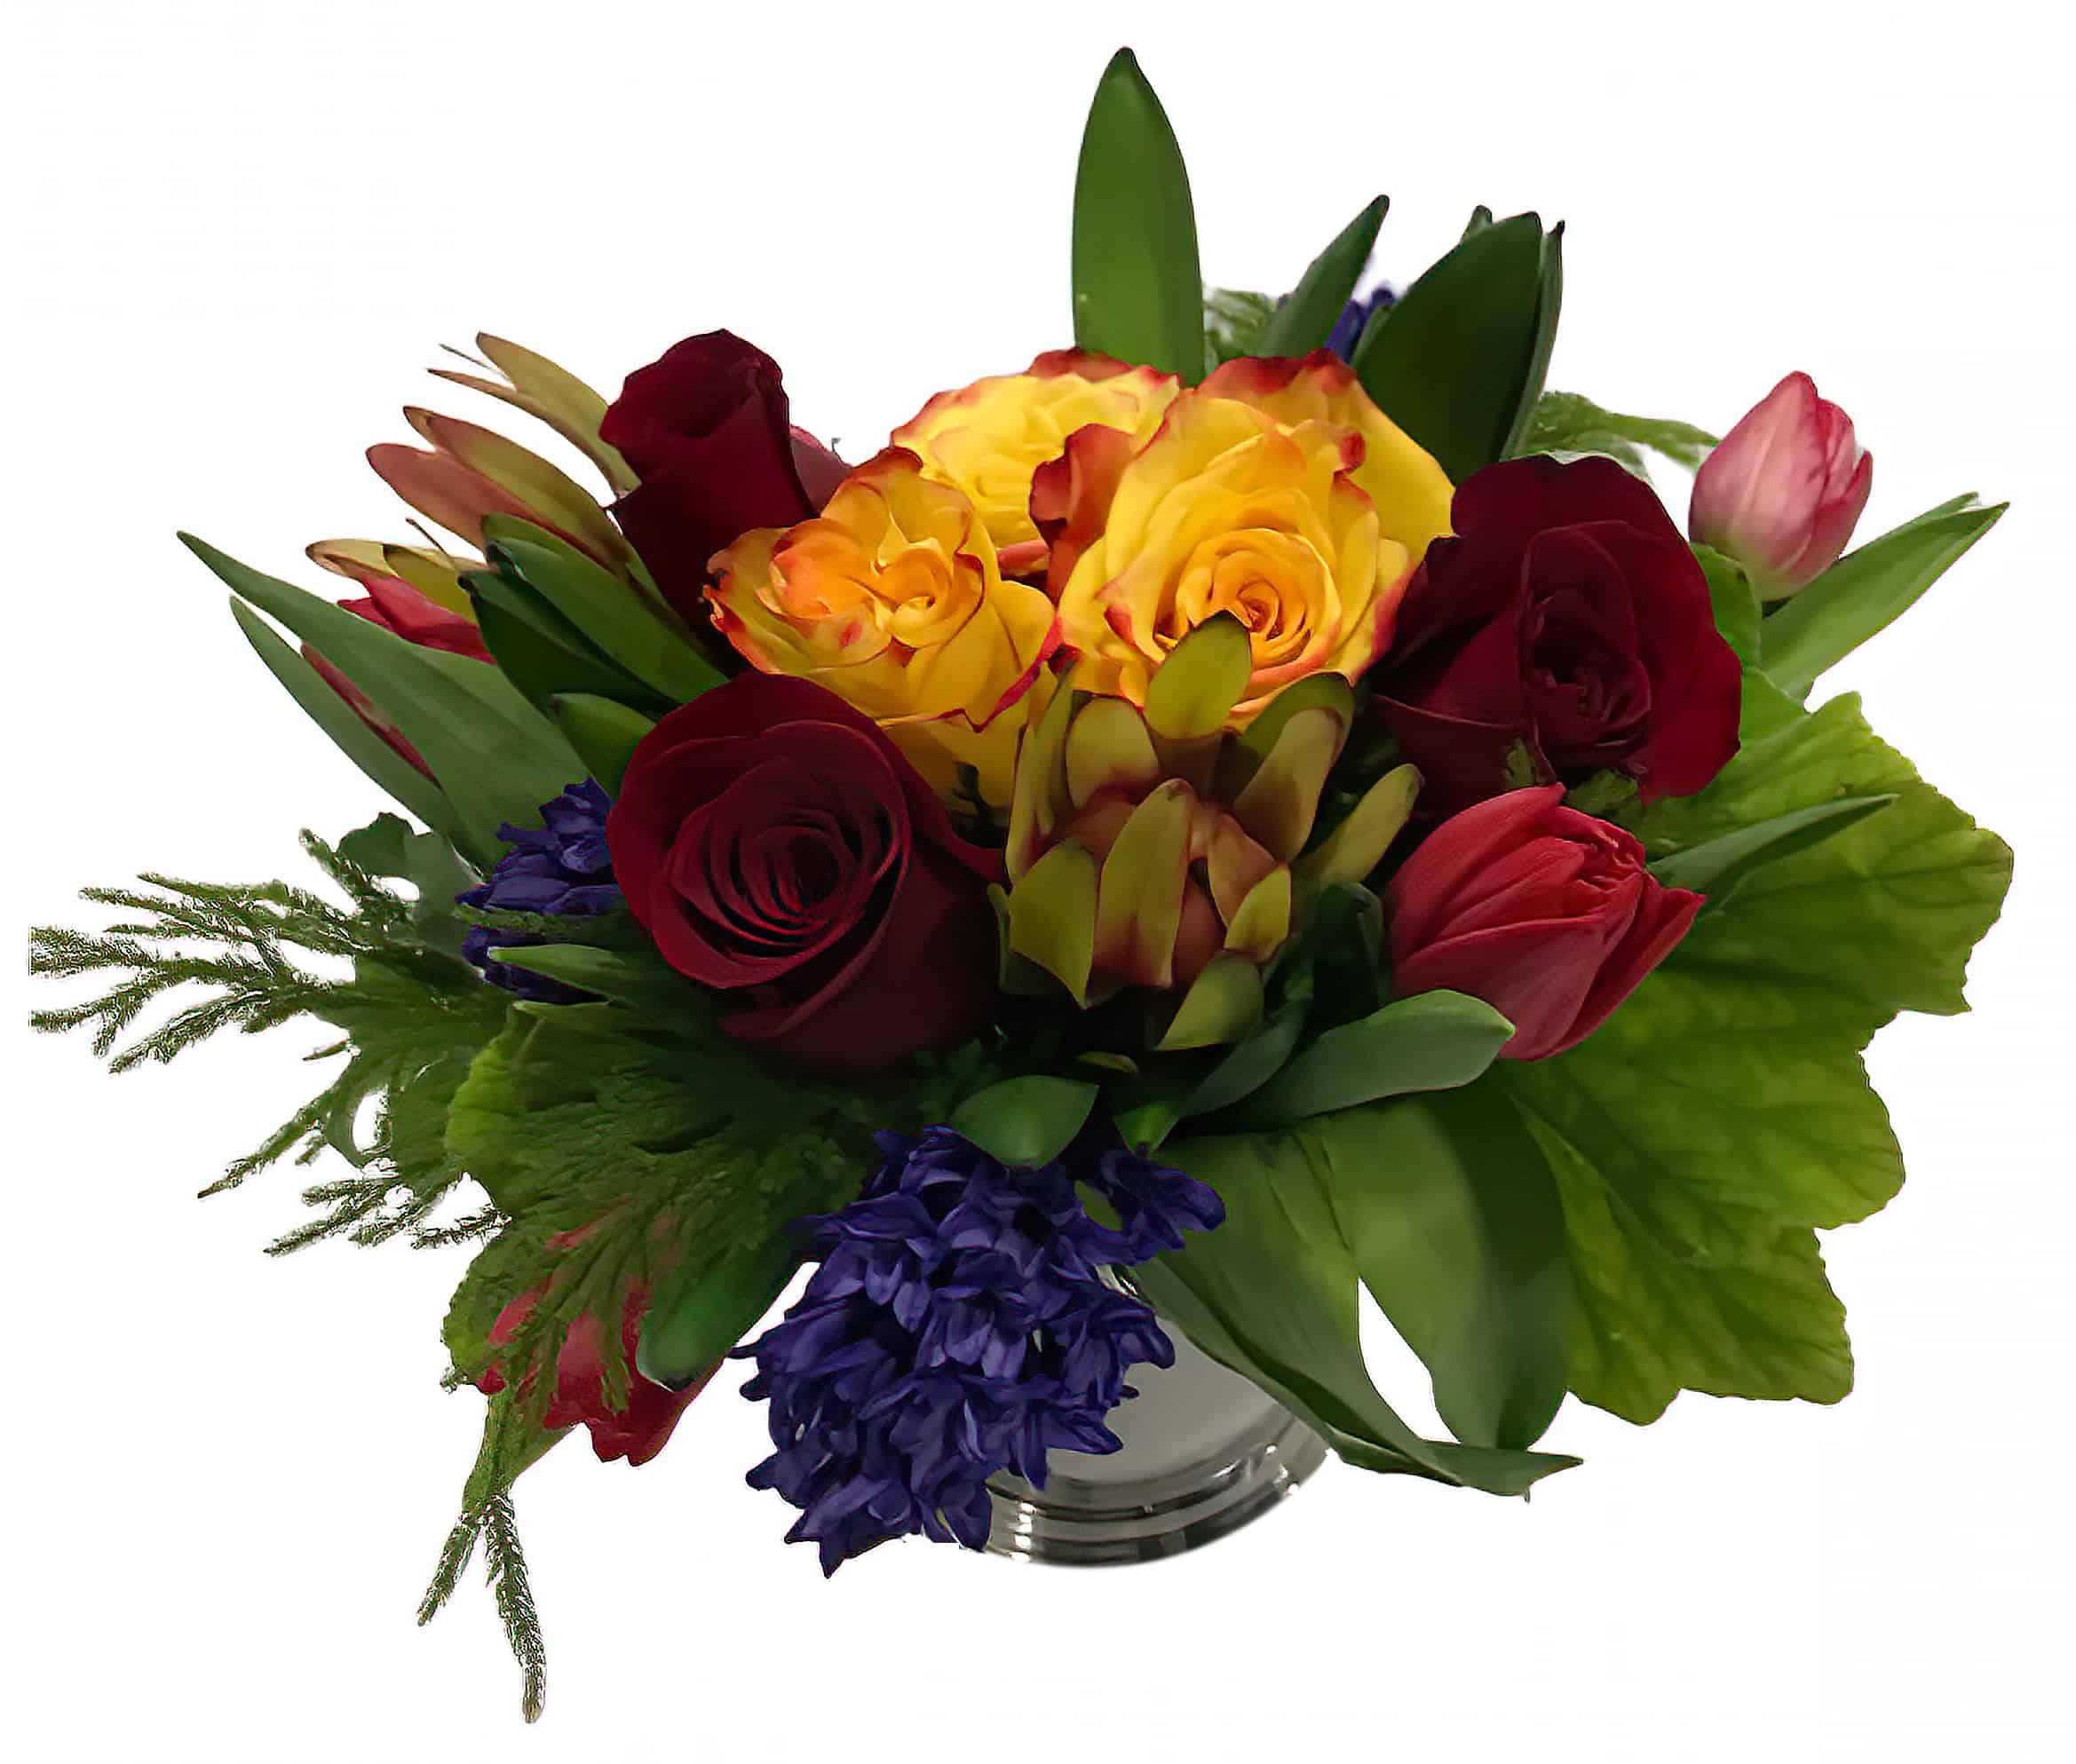 Primary Prince Floral Arrangement